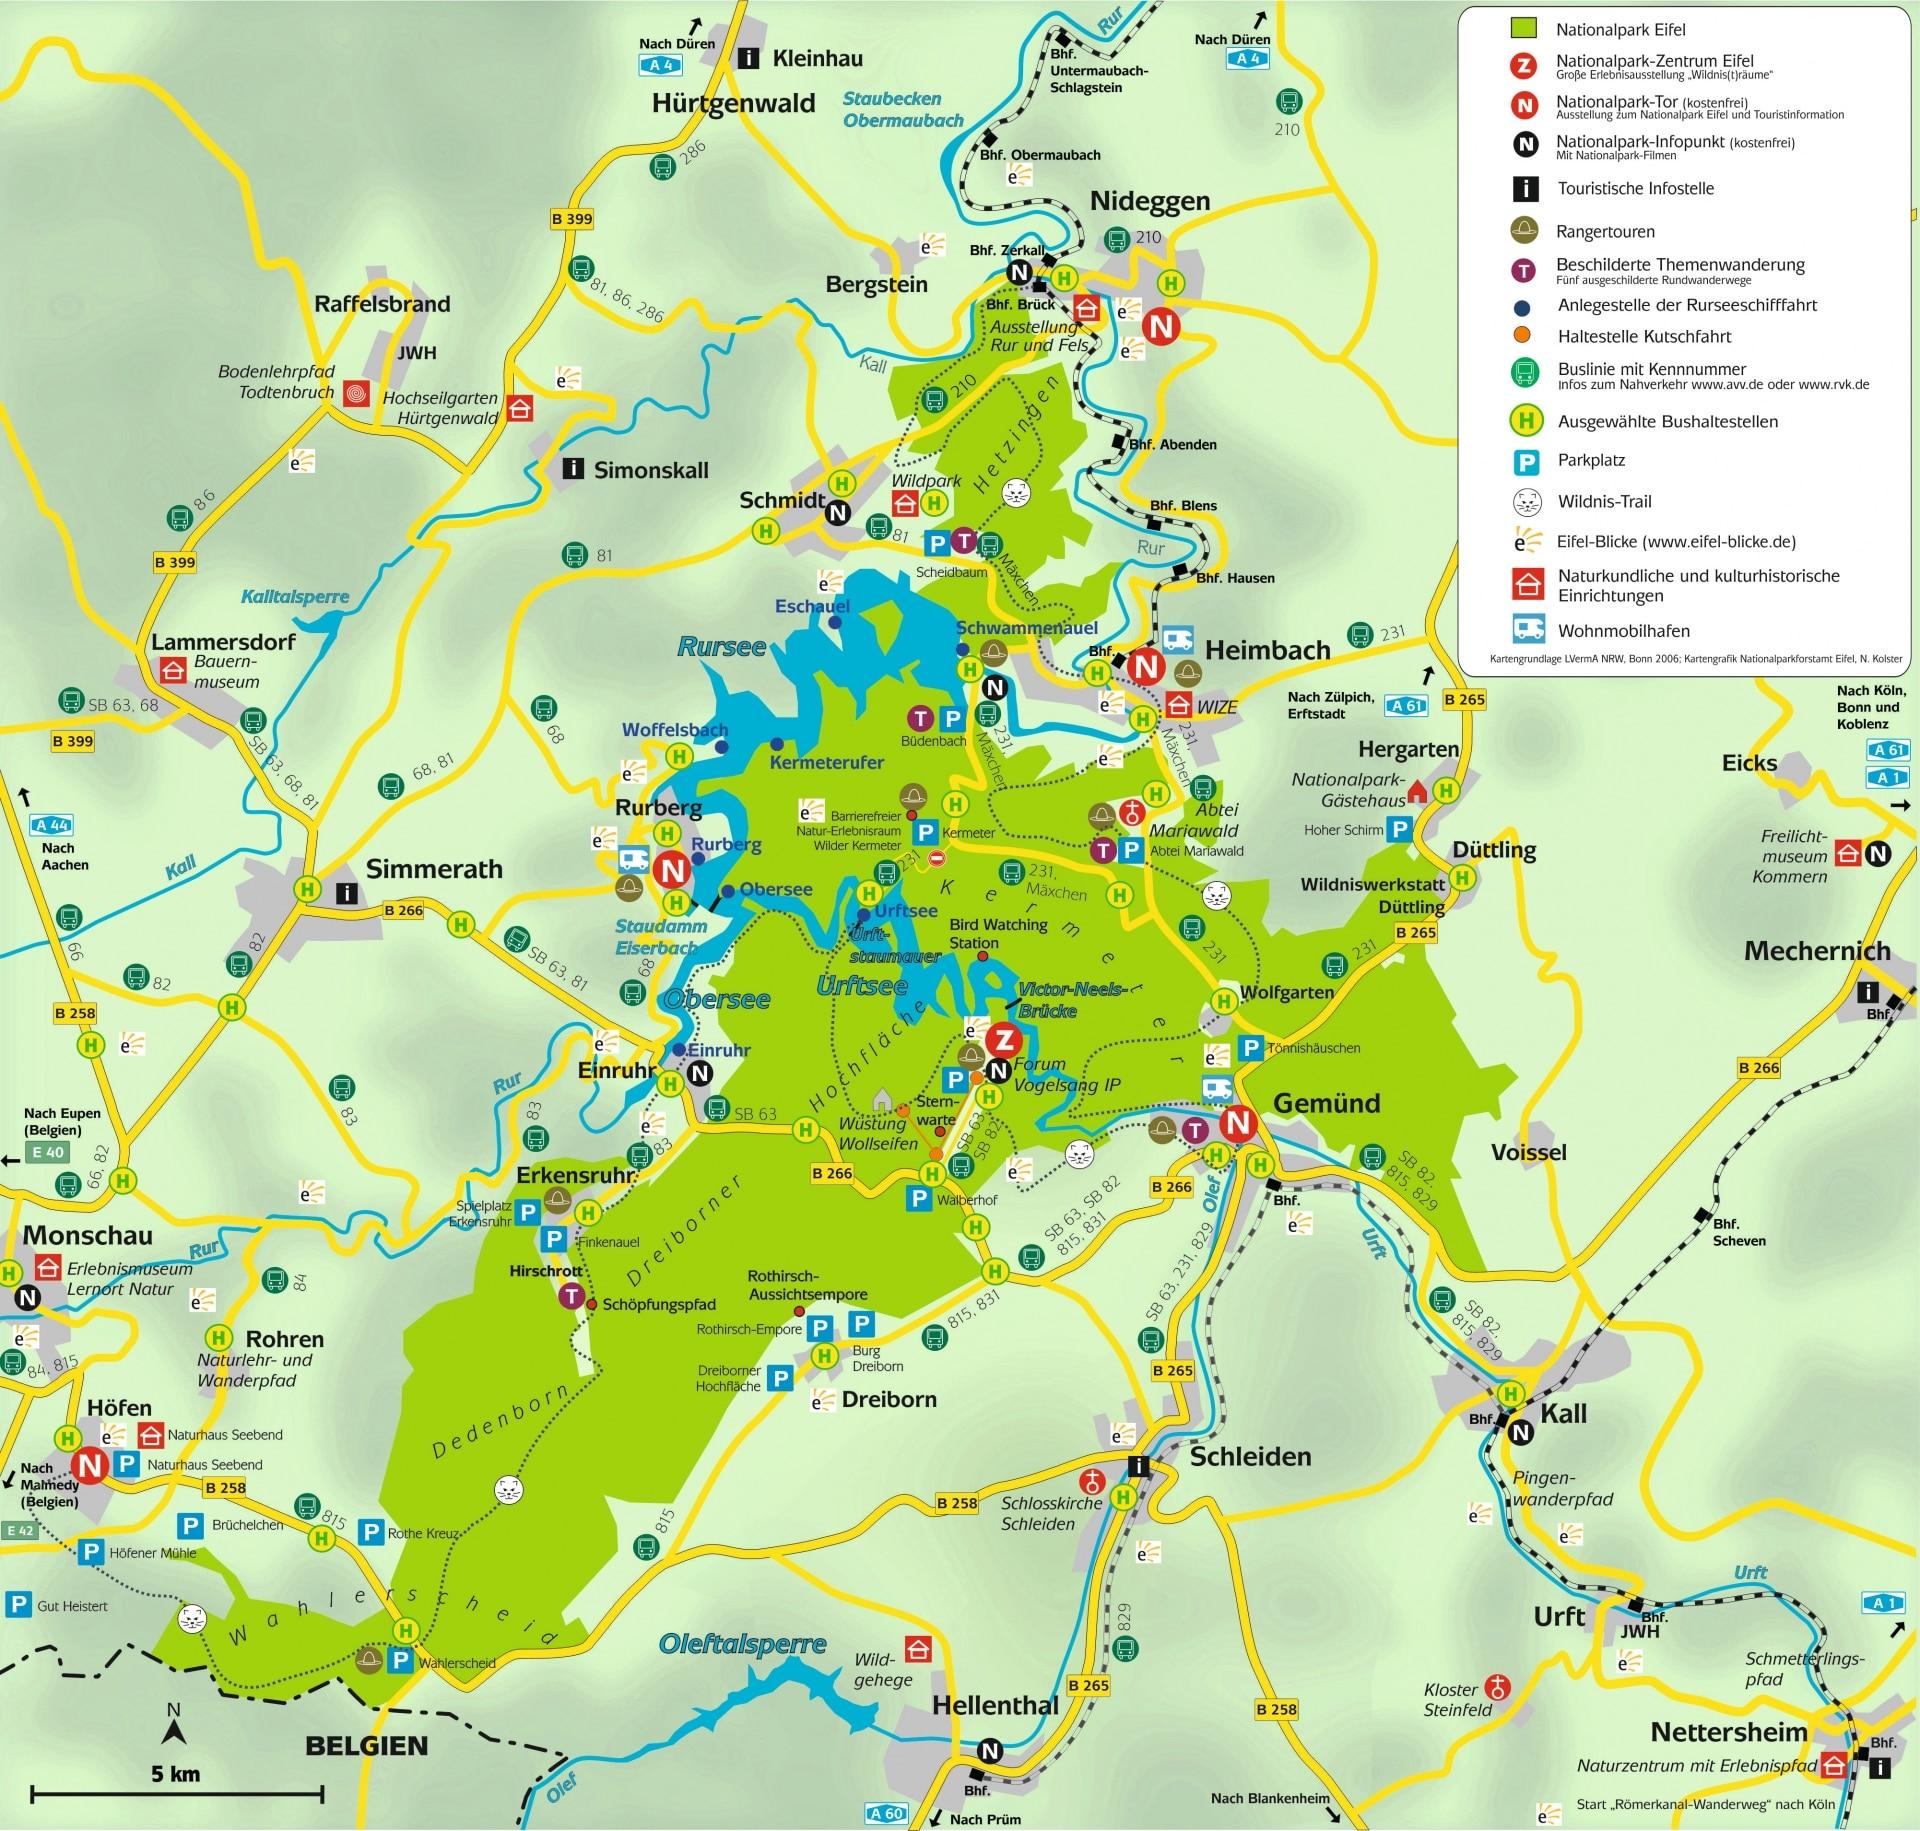 Nationalpark Eifel Karte.Bücher Und Karten Nationalpark Eifel